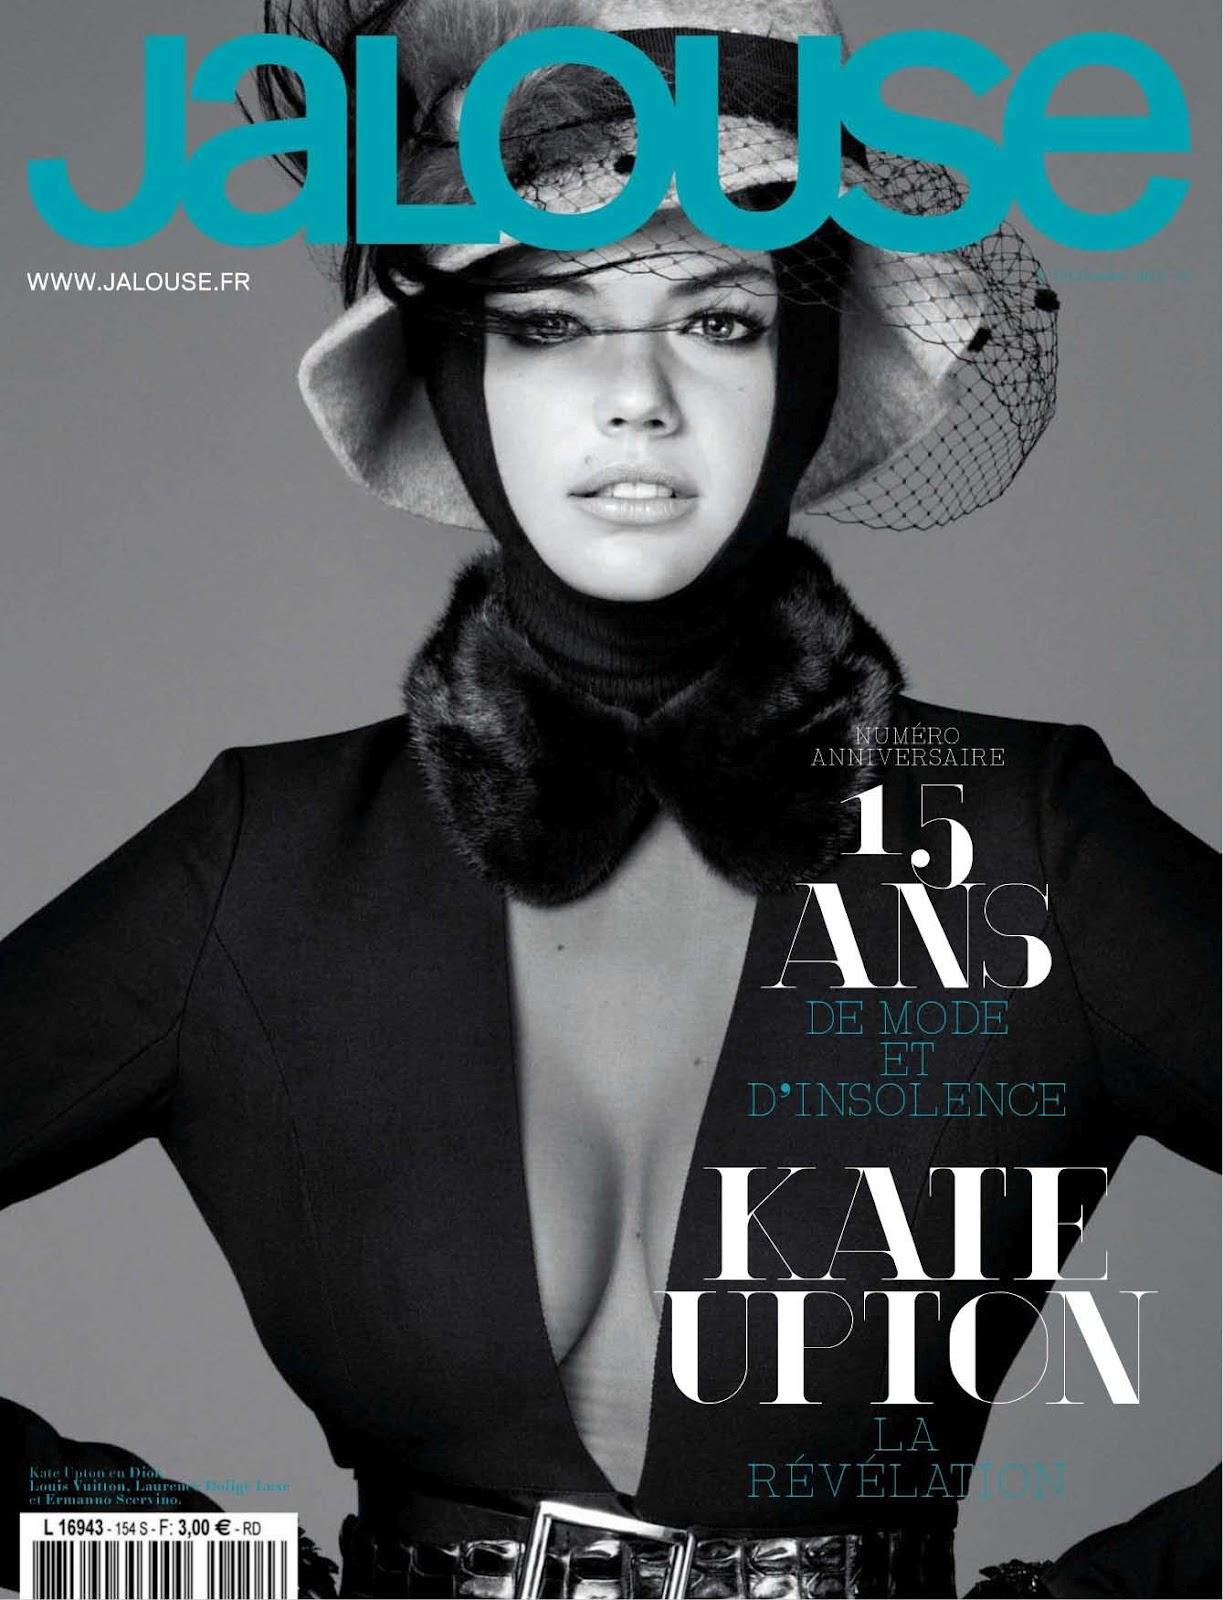 http://4.bp.blogspot.com/-xf1Z4YpUo9g/UGSTy43S5gI/AAAAAAABA2I/Zue6S544JJQ/s1600/Kate+Upton+Hot+Jalouse+(1).jpg